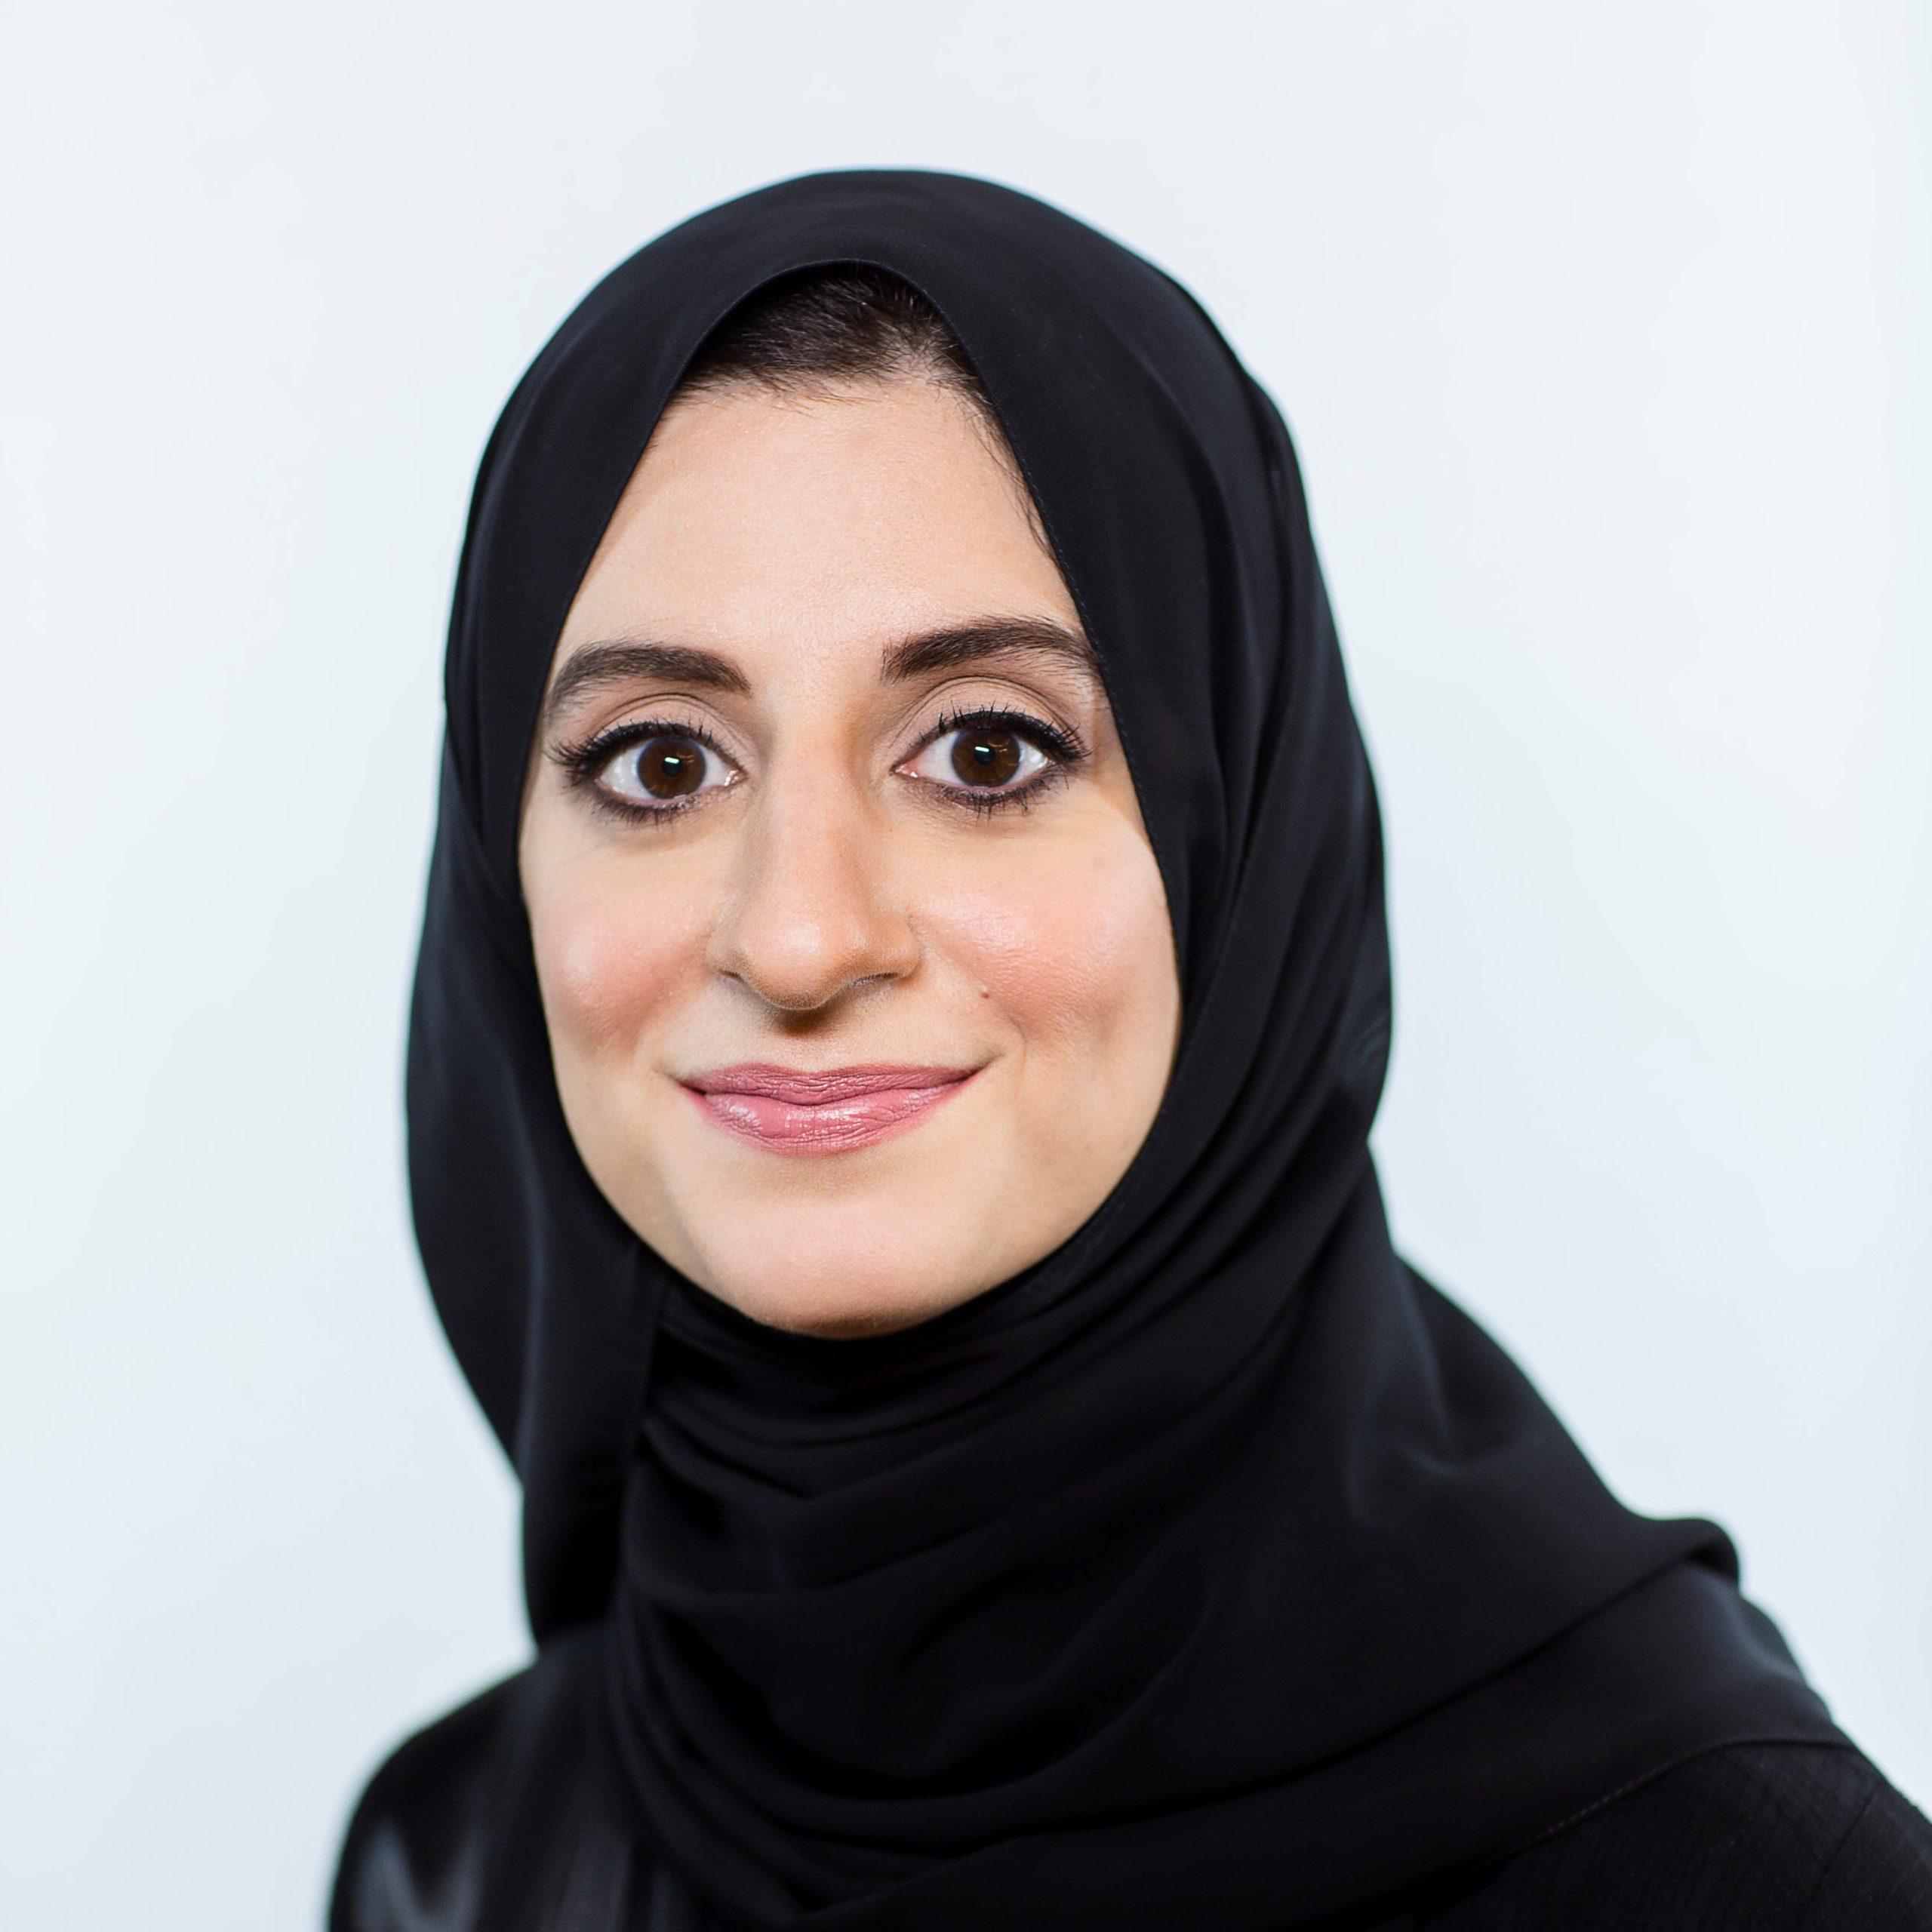 Her Excellency Huda AlHashimi